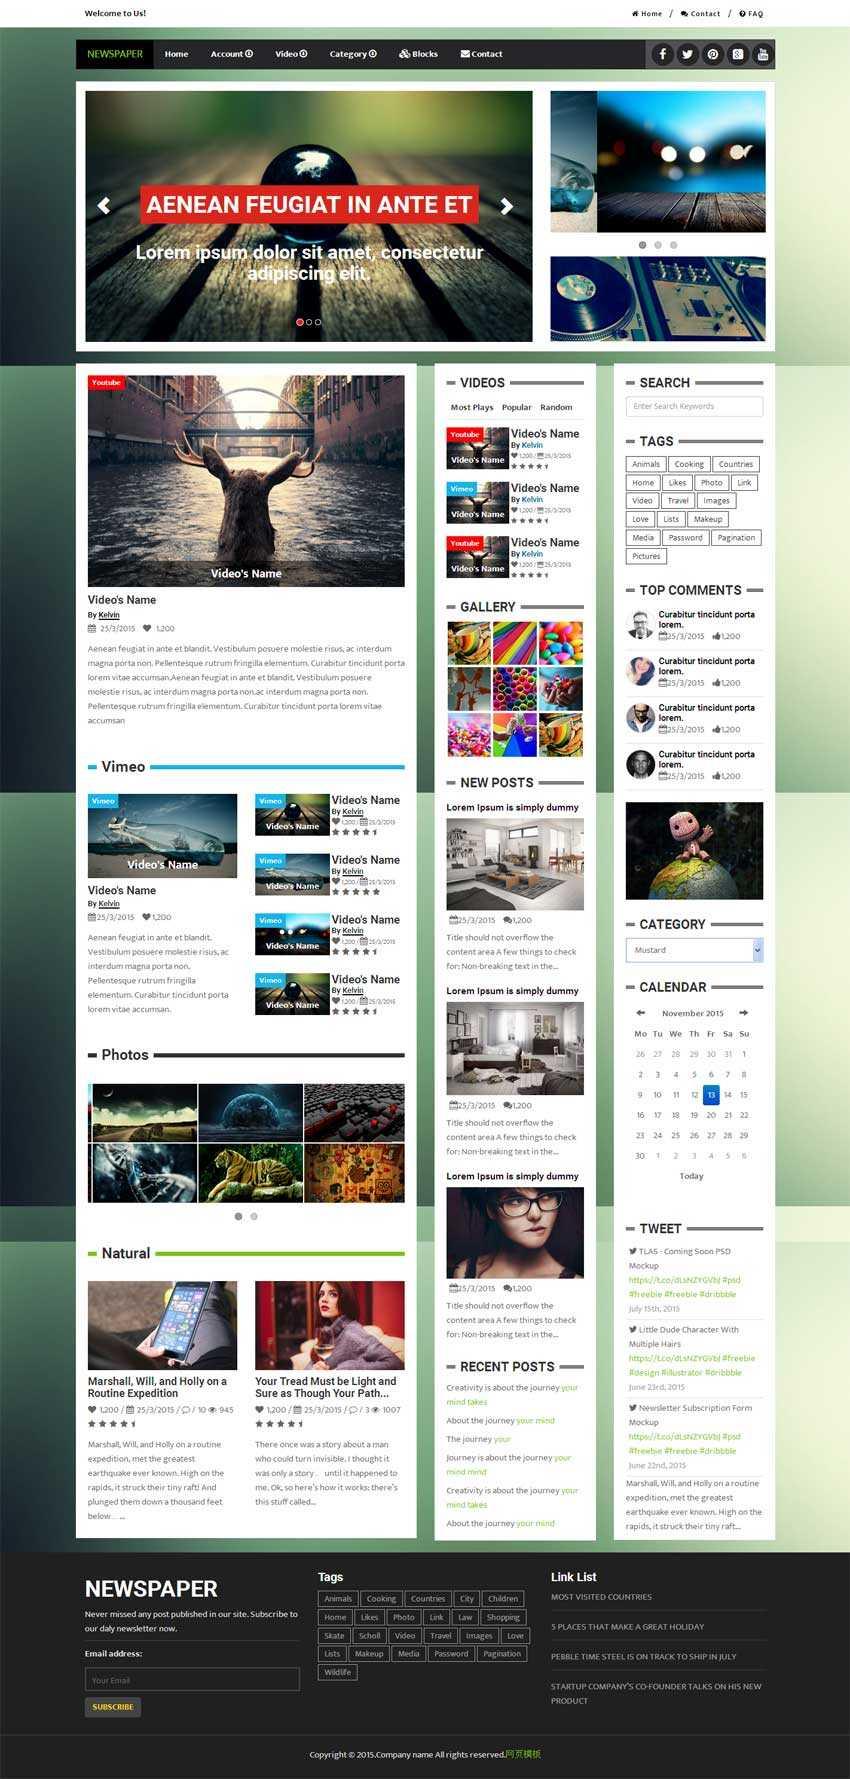 html5 css3国外新闻视频博客网站响应式模板